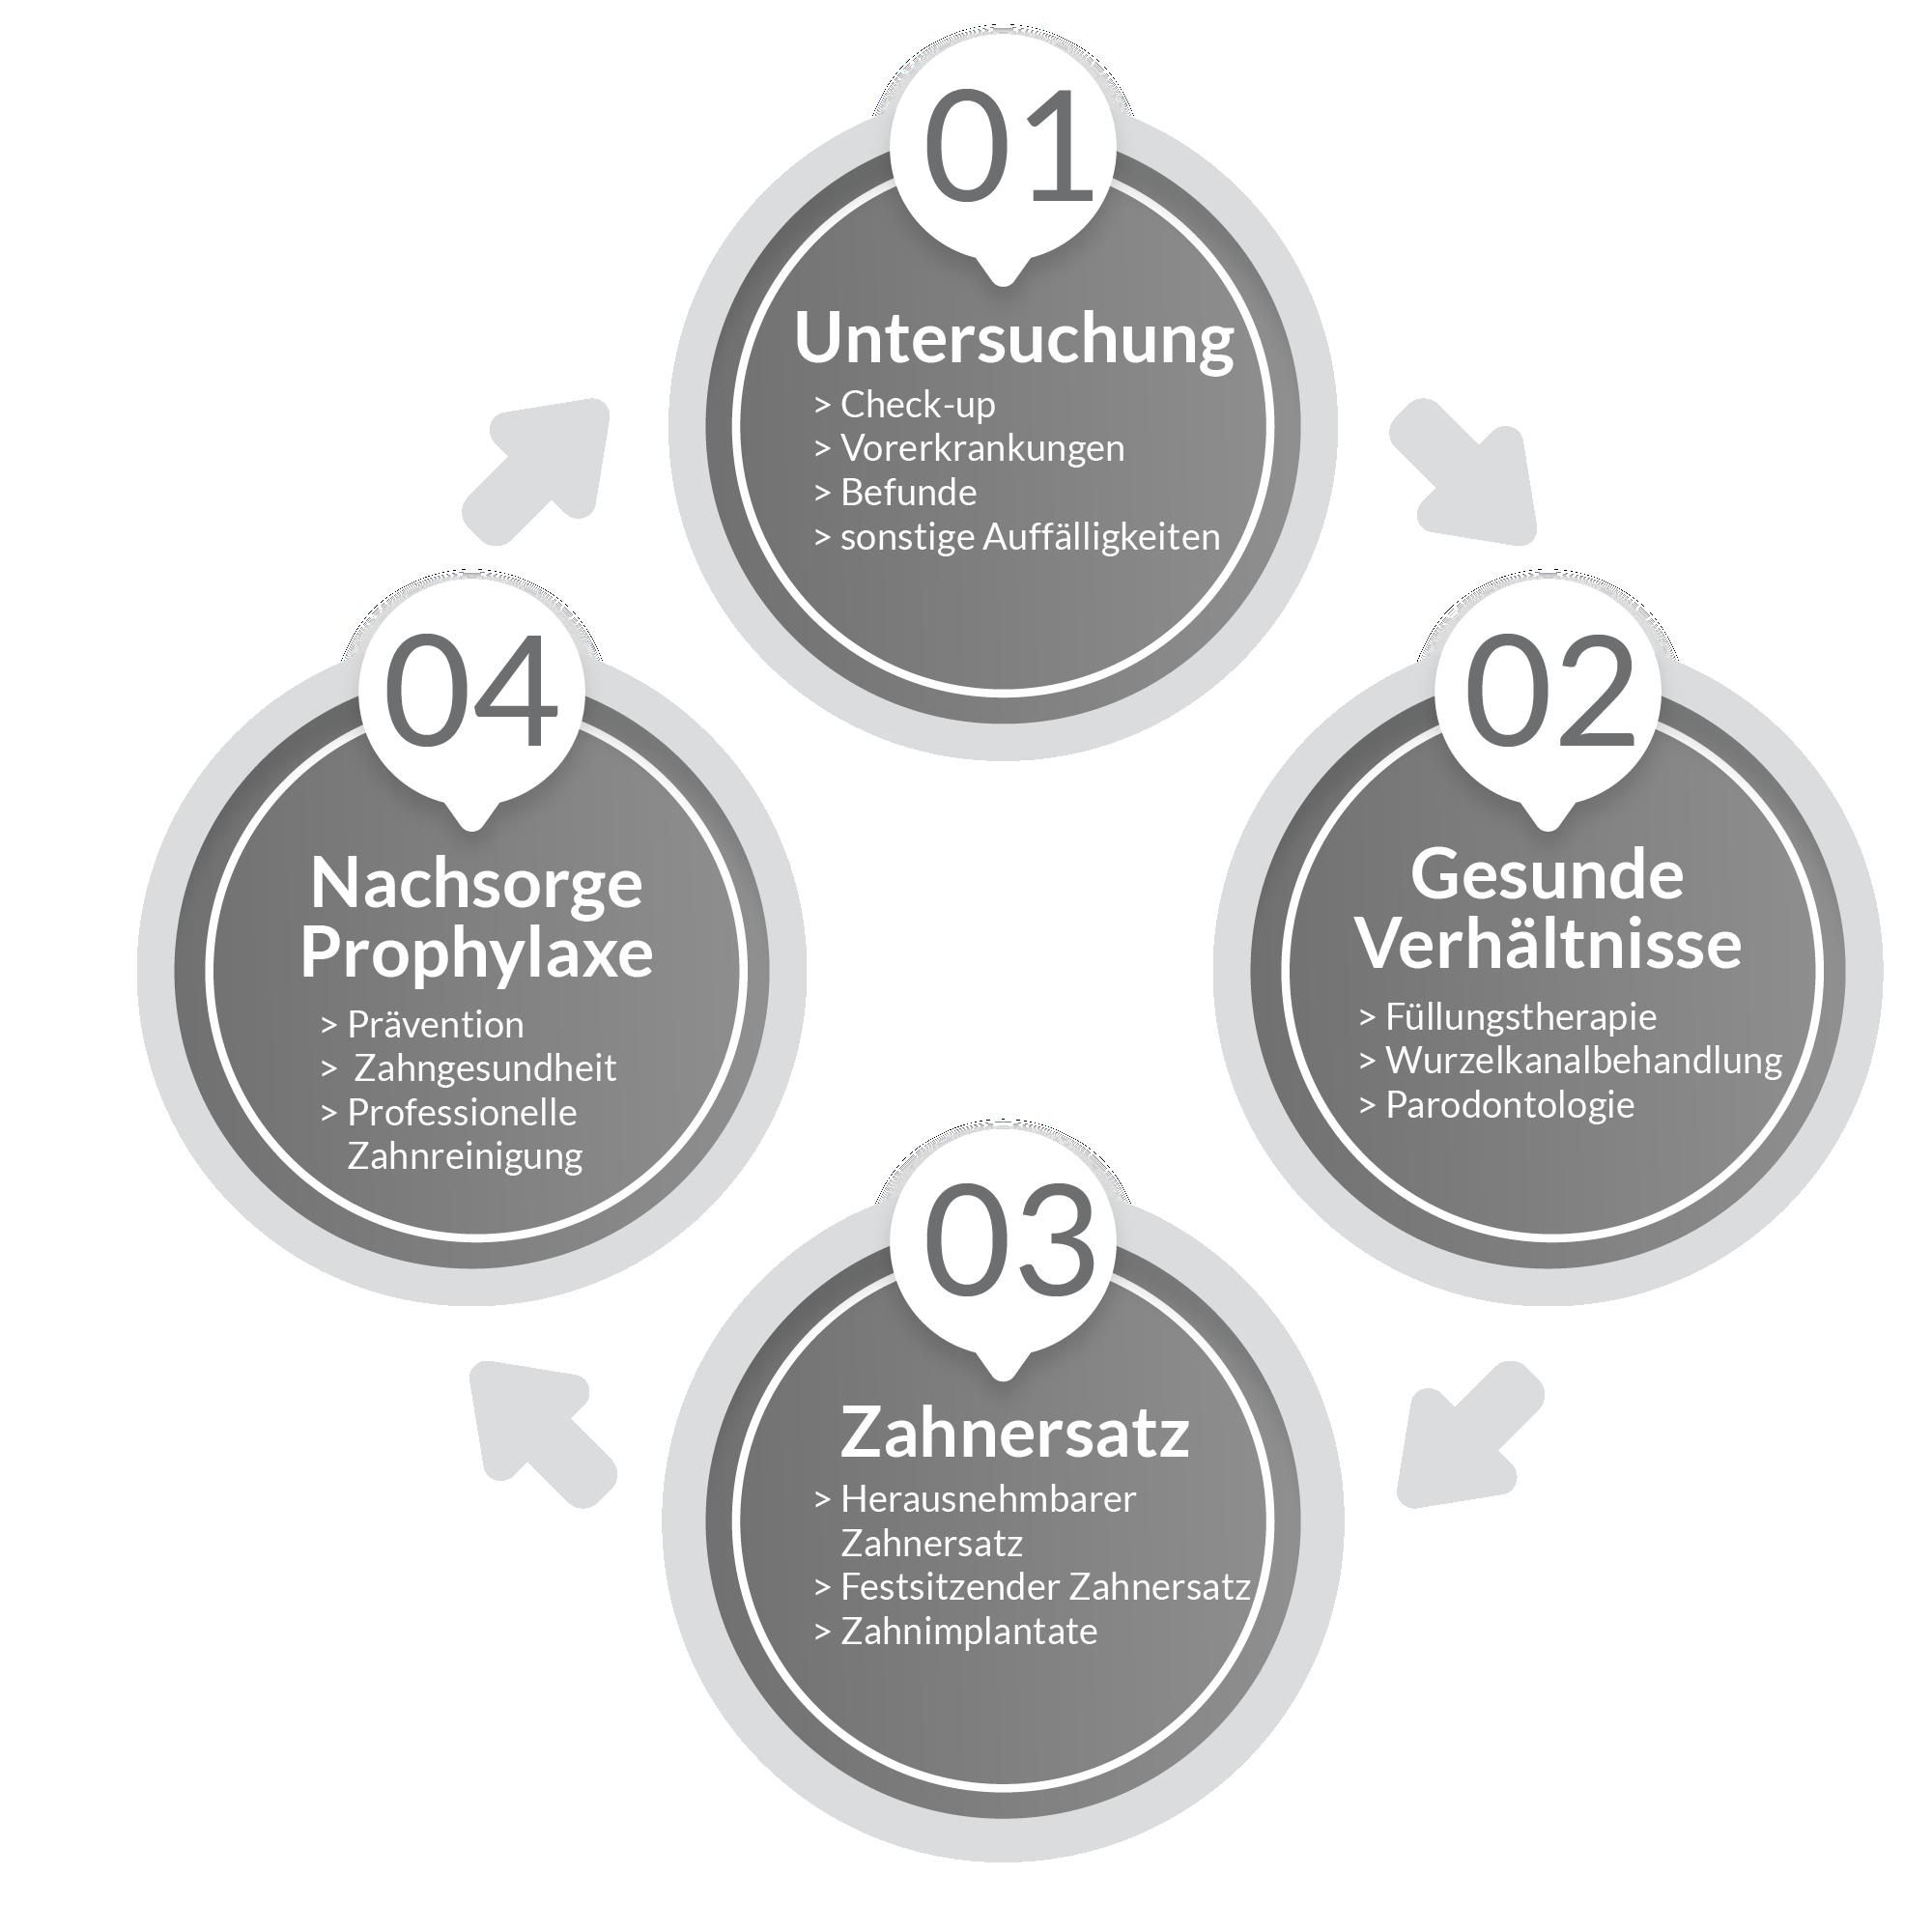 Praxiskonzept IDent Kassel, Dr. Davarpanah